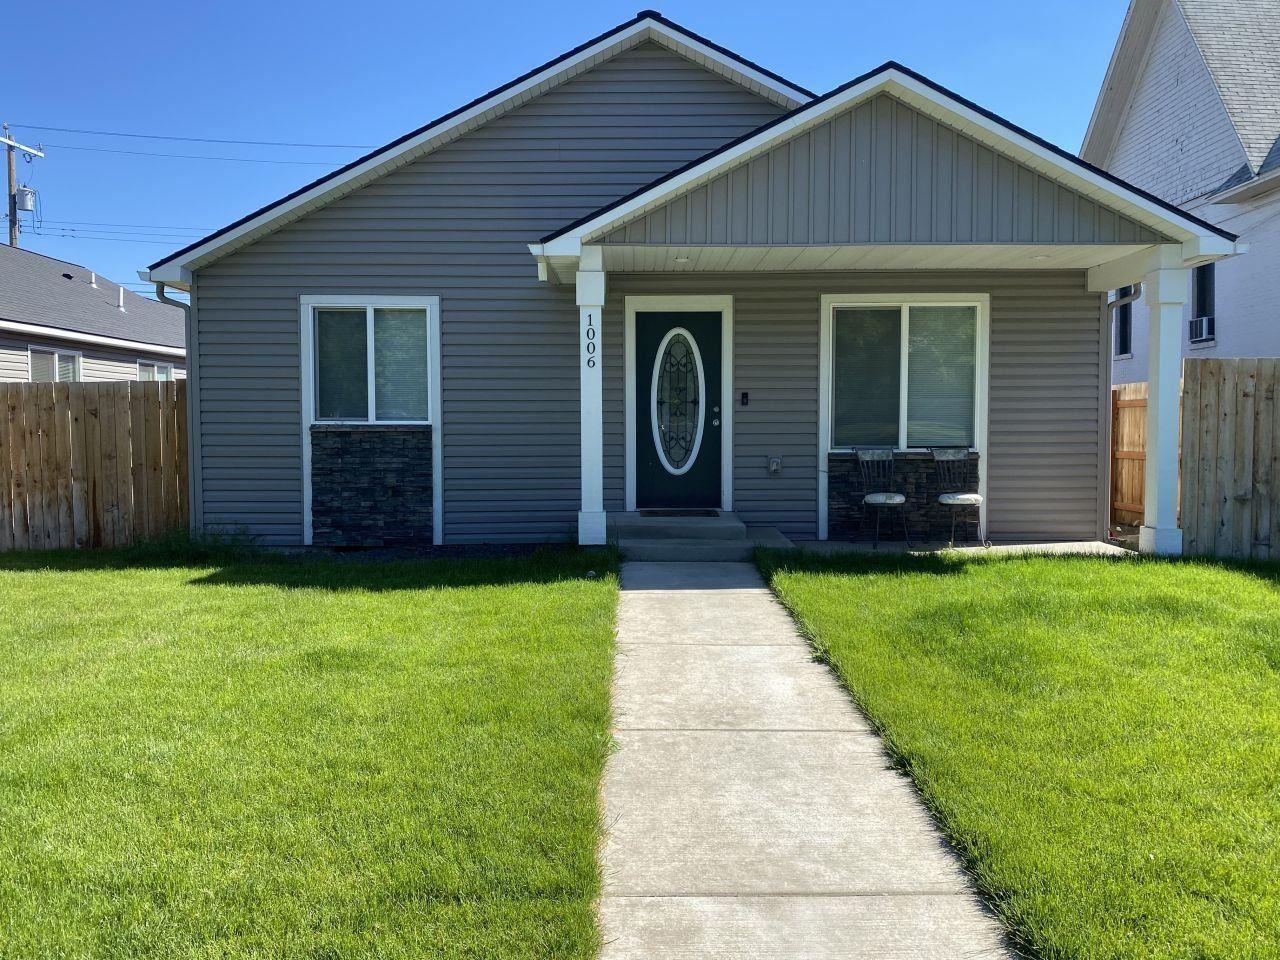 1006 E Montgomery Ave, Spokane, WA 99207 - #: 202116555